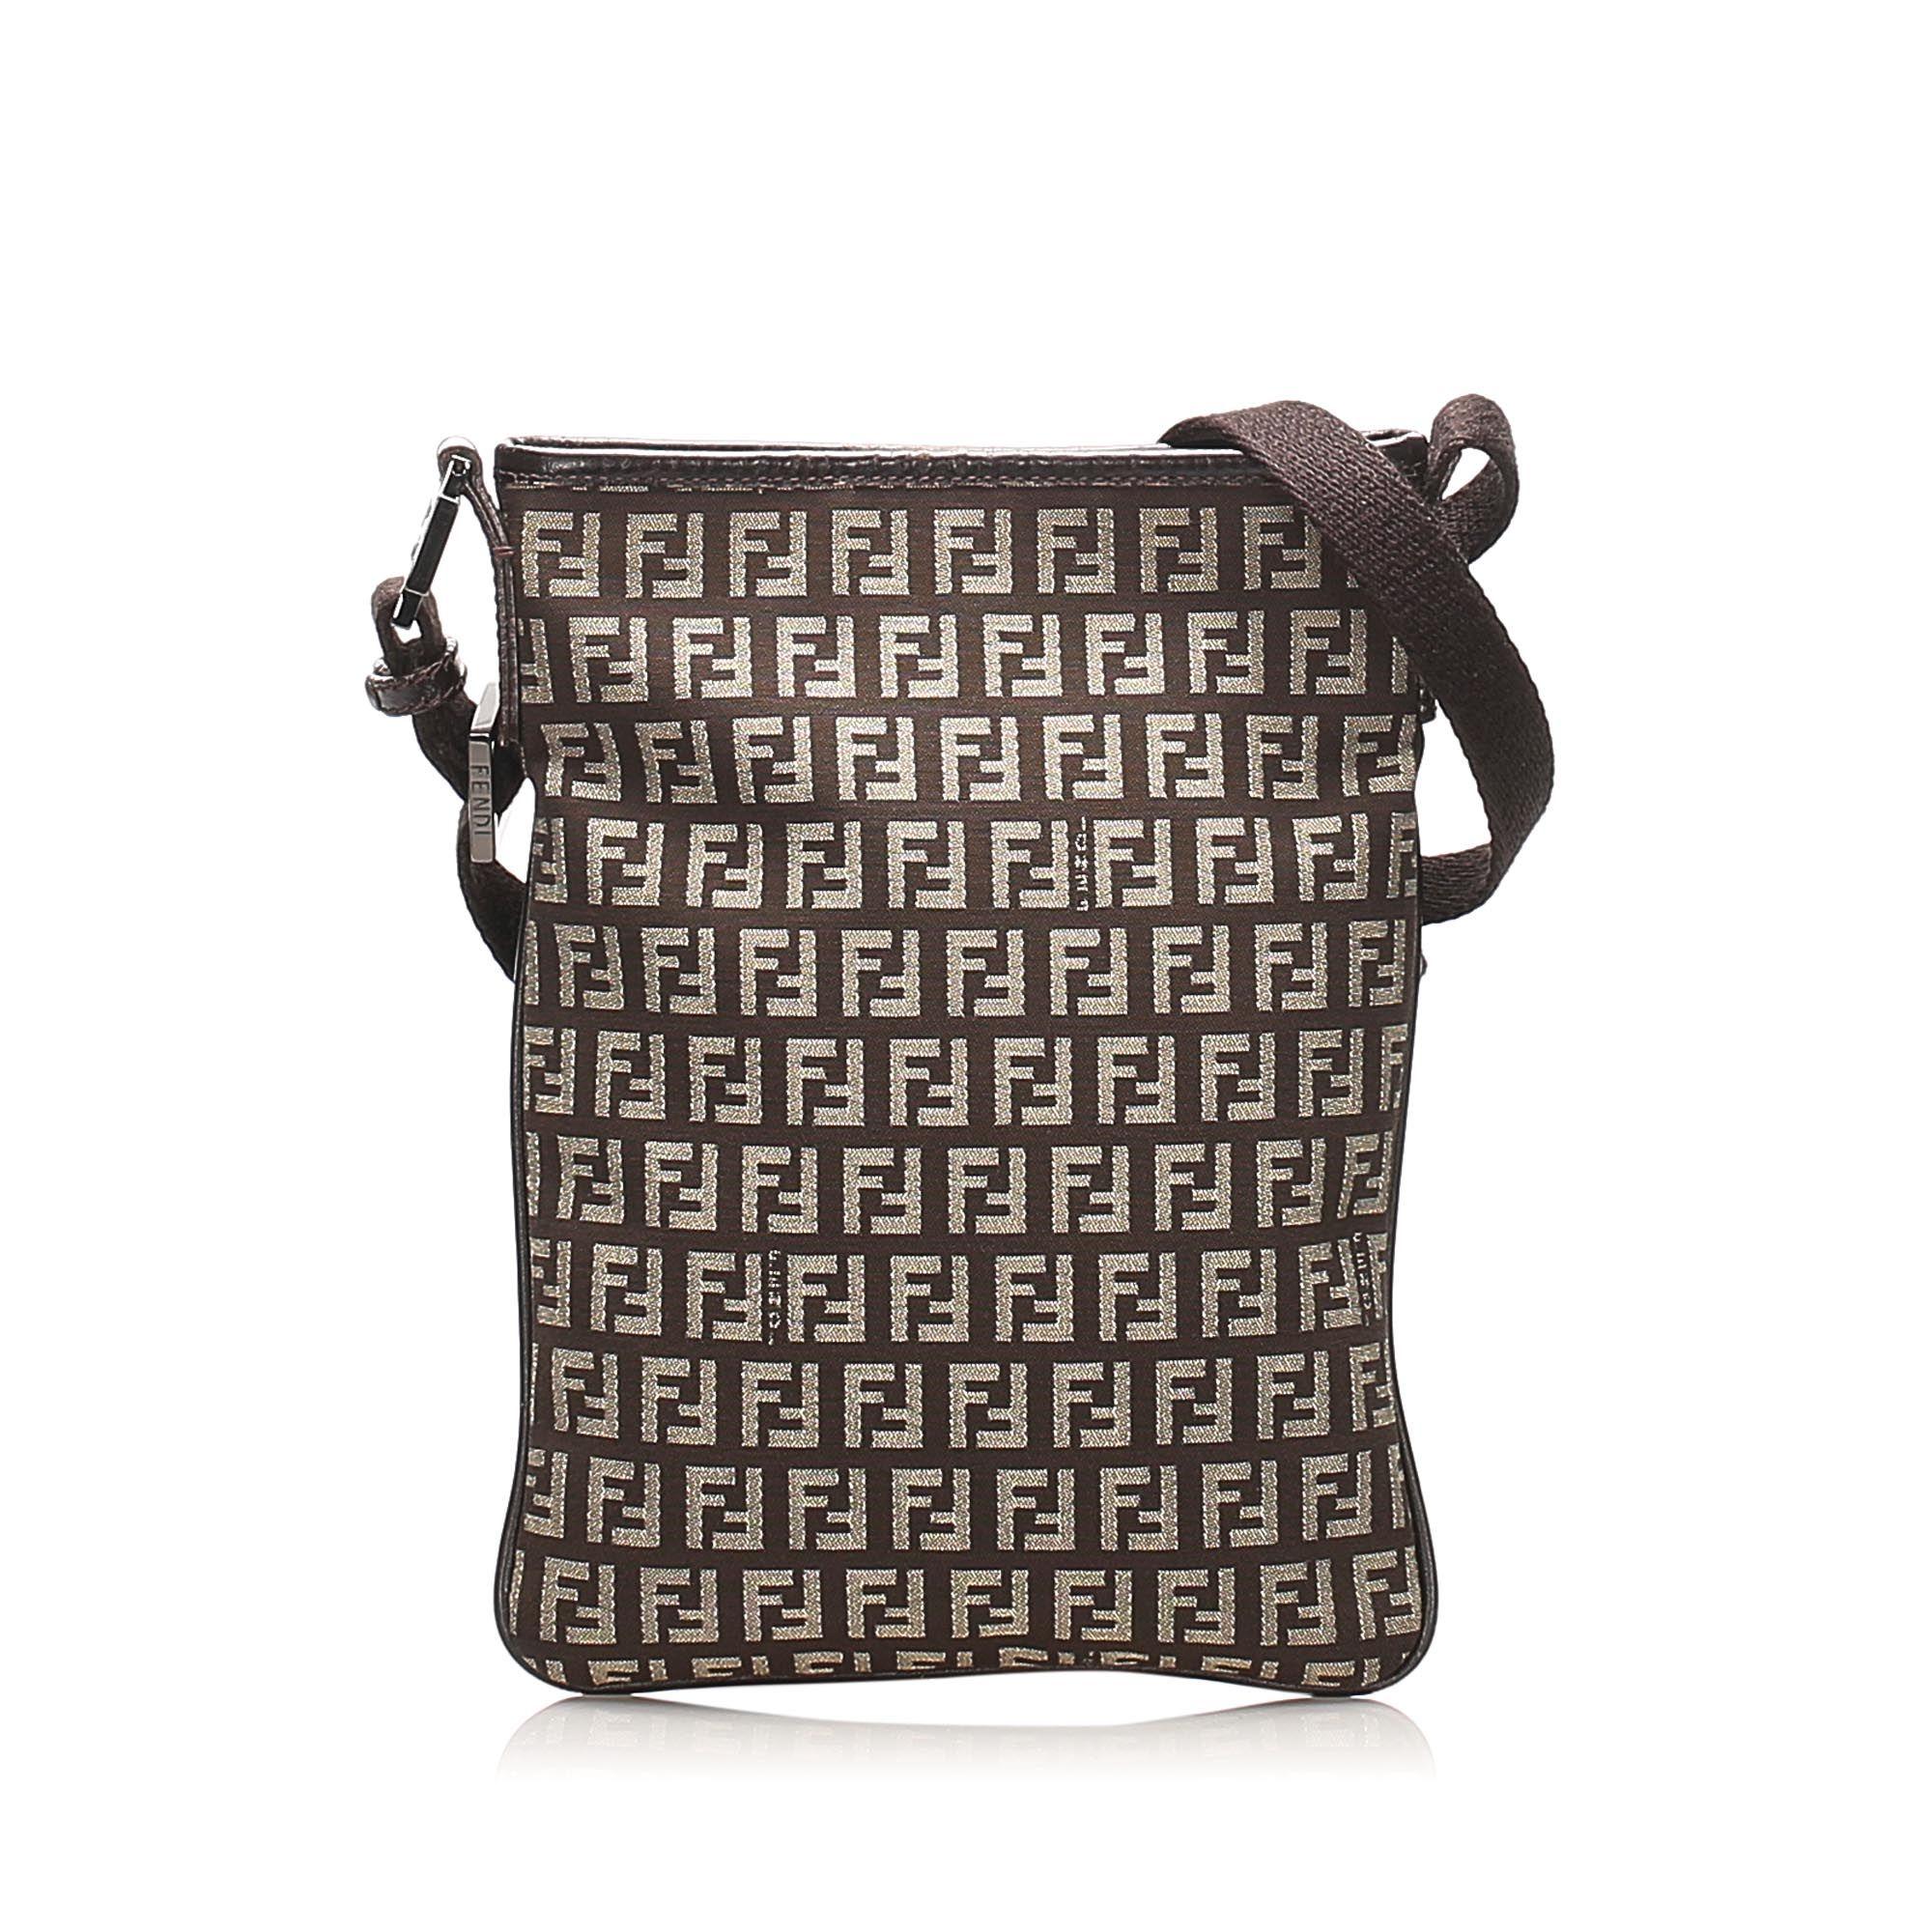 Vintage Fendi Zucchino Canvas Crossbody Bag Brown